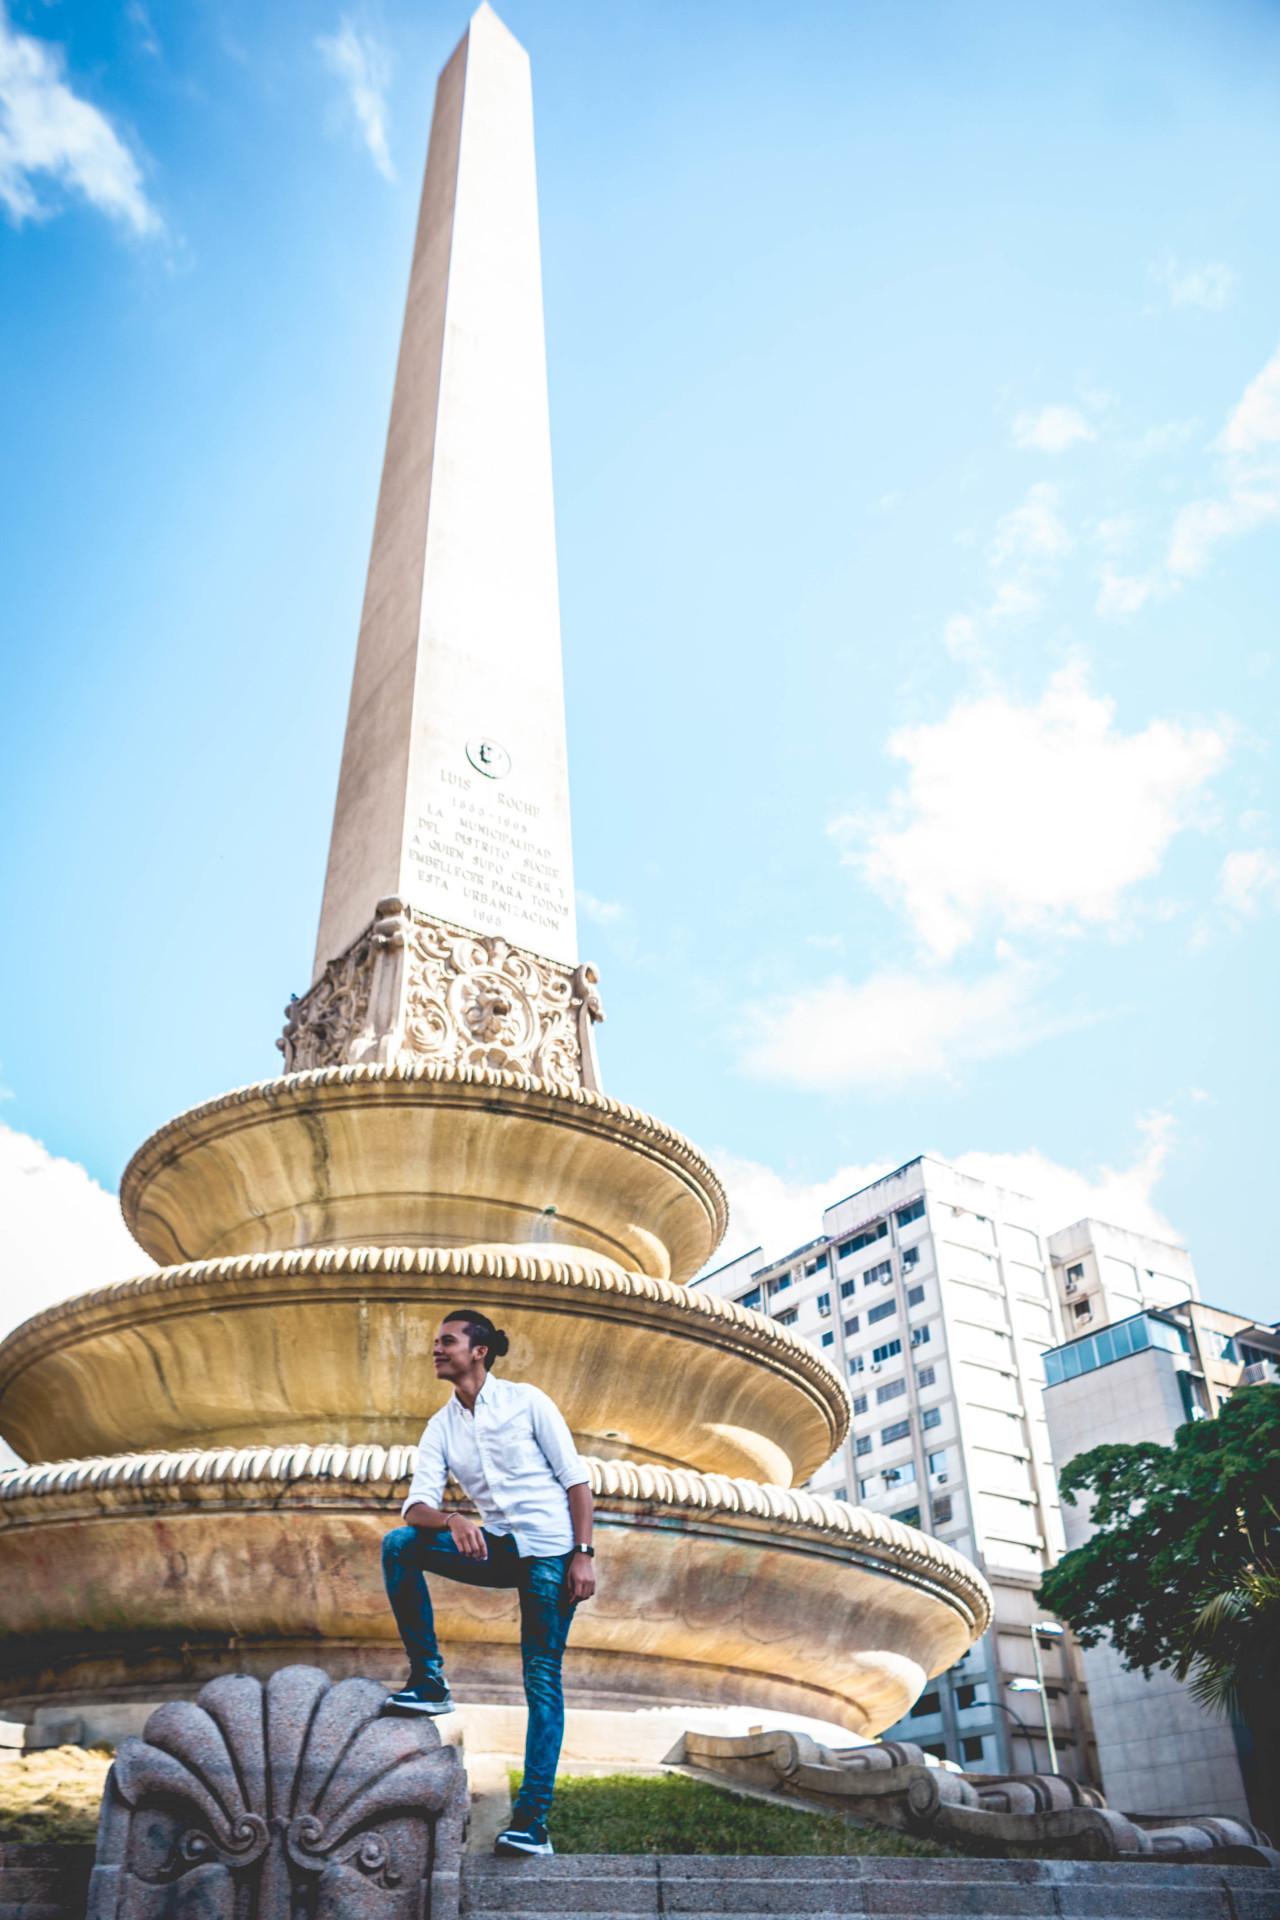 Plaza Altamira